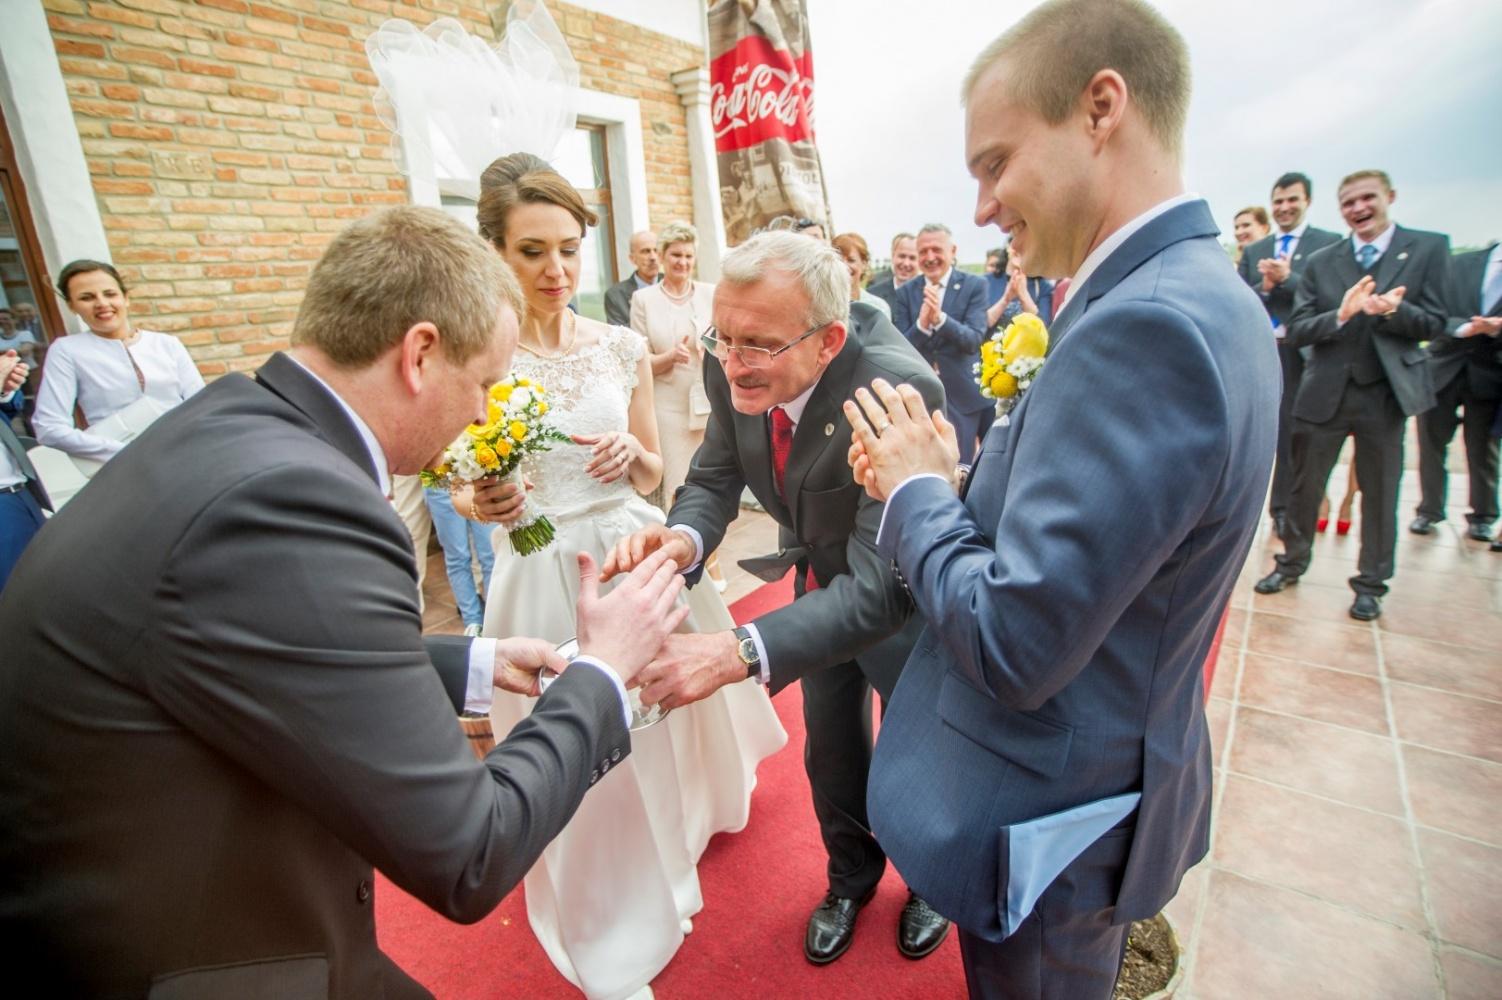 http://www.fotoz.sk/images/gallery-23/normal/svadba-_sv_petrus-vini_097.jpg